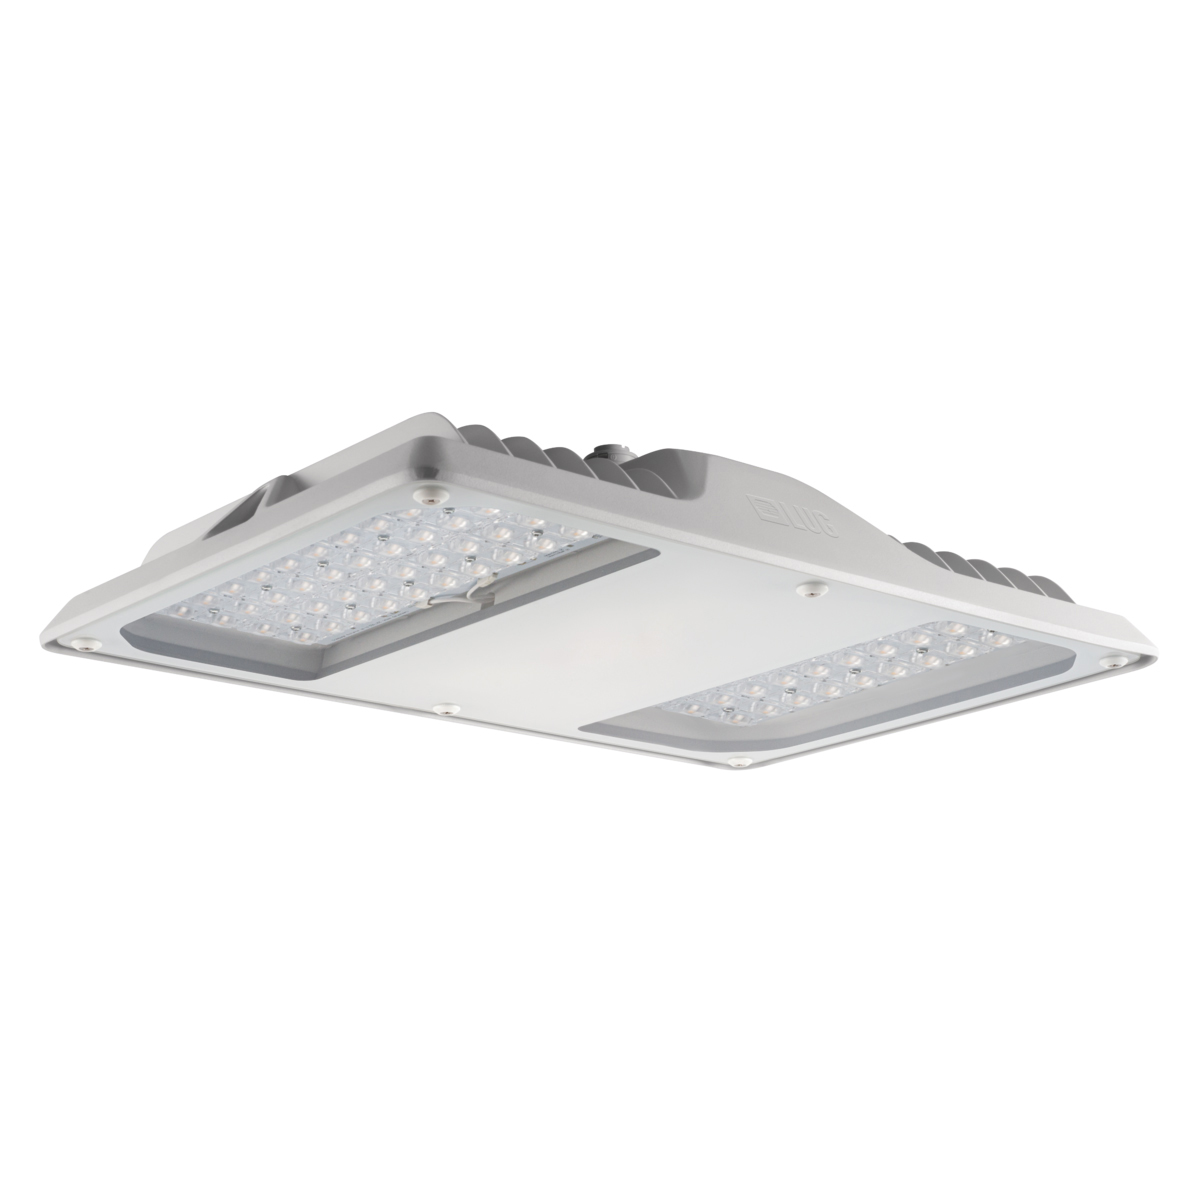 Arktur Square LED 105W 11800lm/840 EVG IP65 55° grau